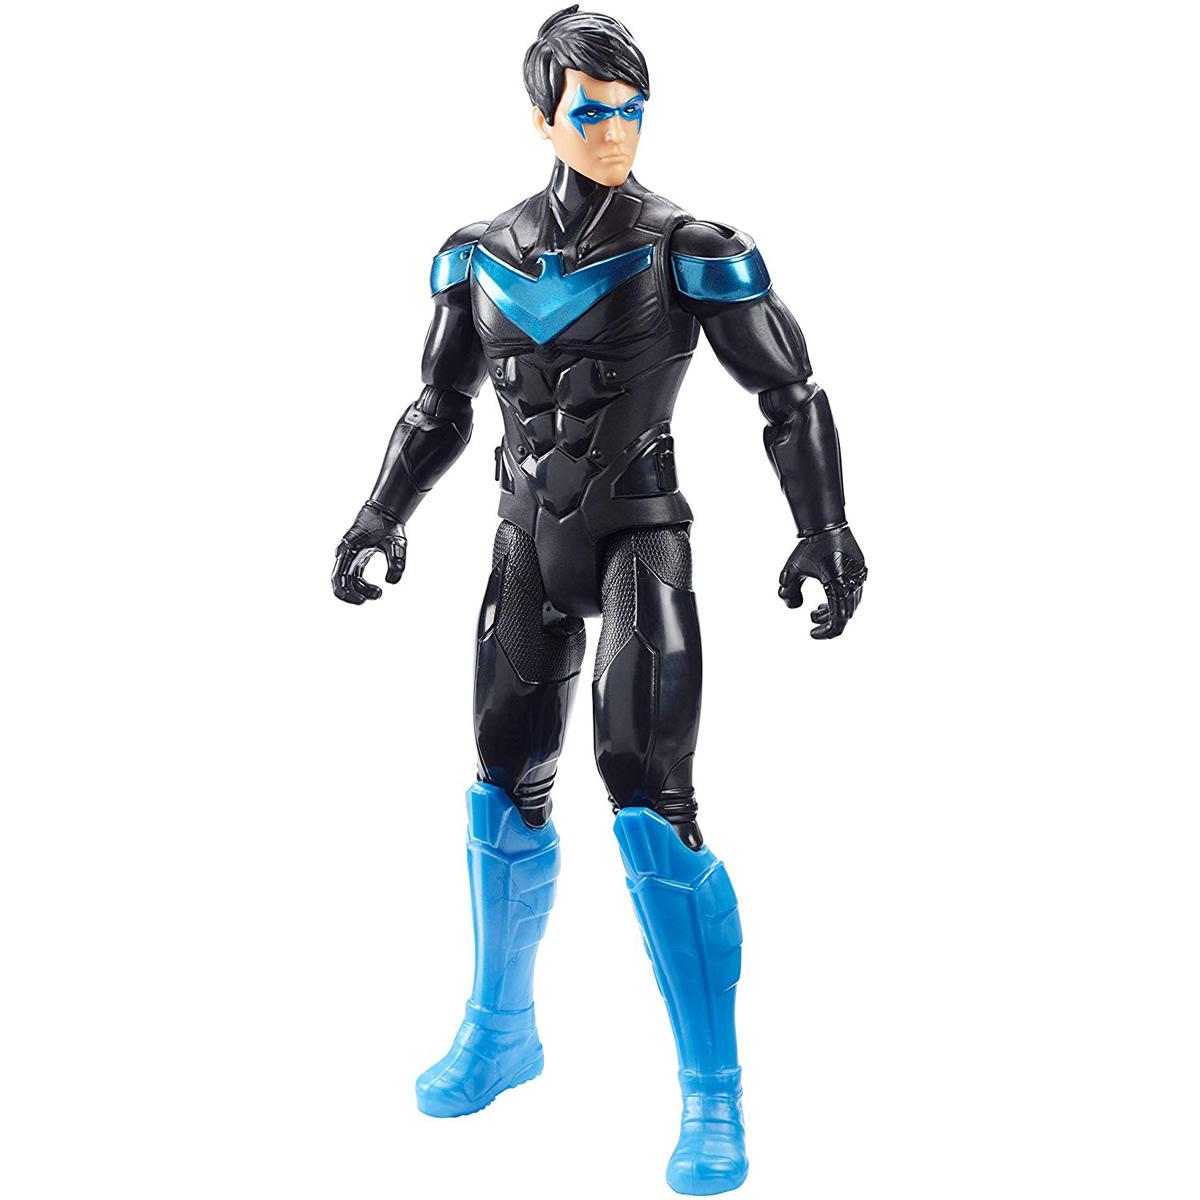 coolshop.co.uk - Batman – 30 cm Figure – Nightwing (20129642)